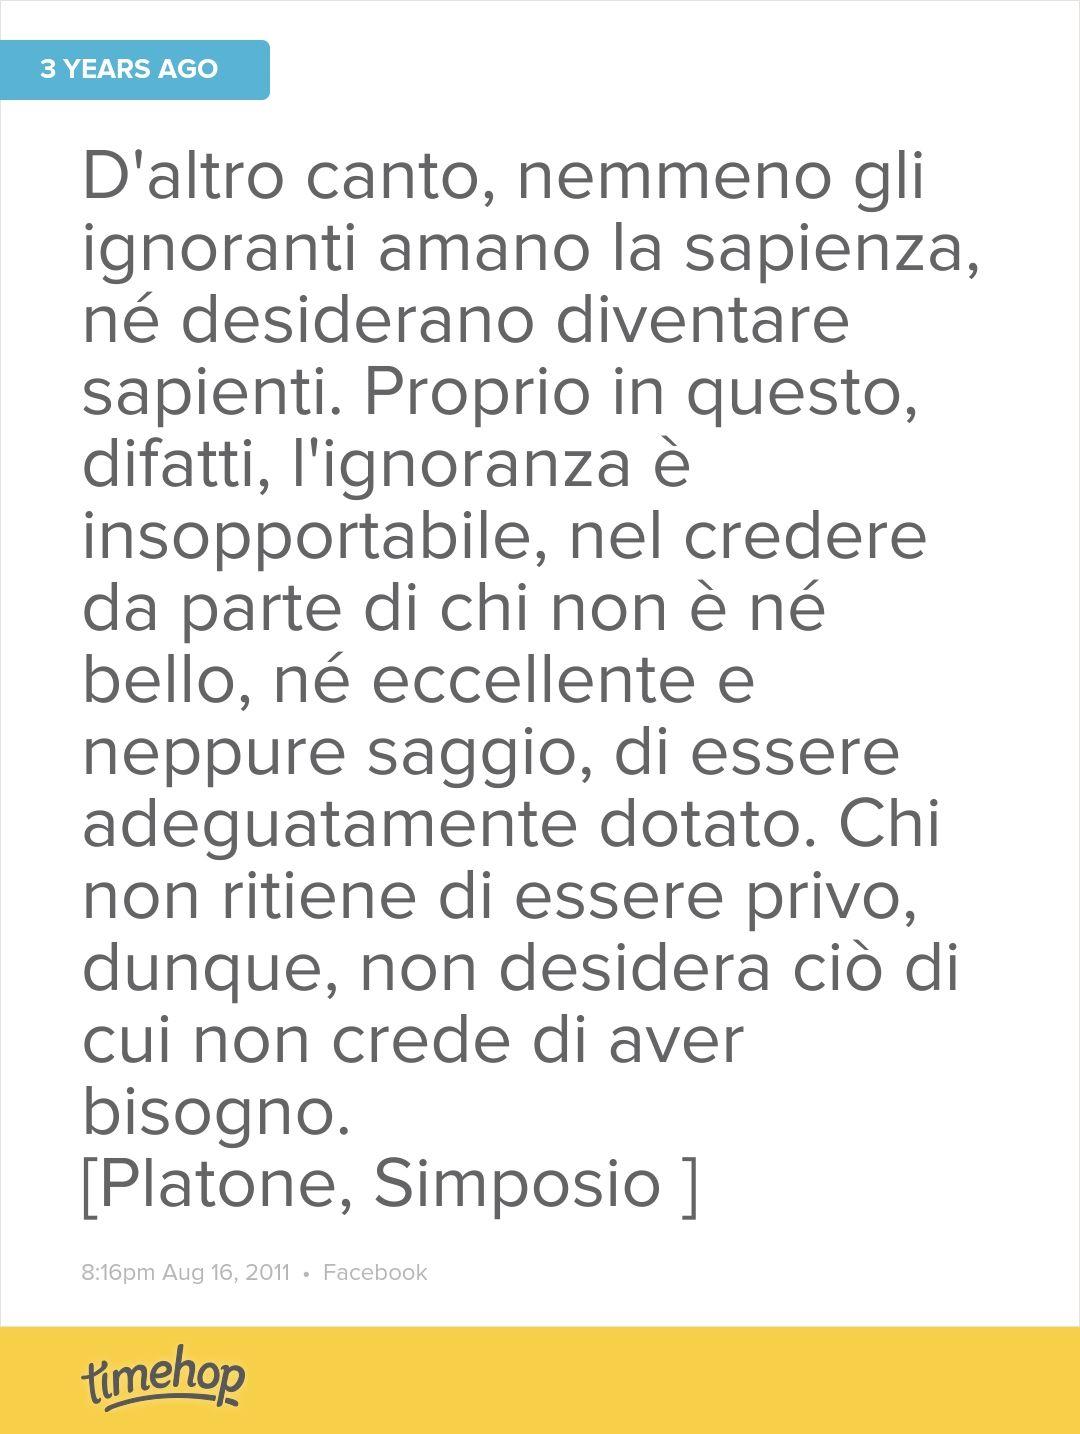 Platone Simposio Quotes 1 Year Ago 1 Year